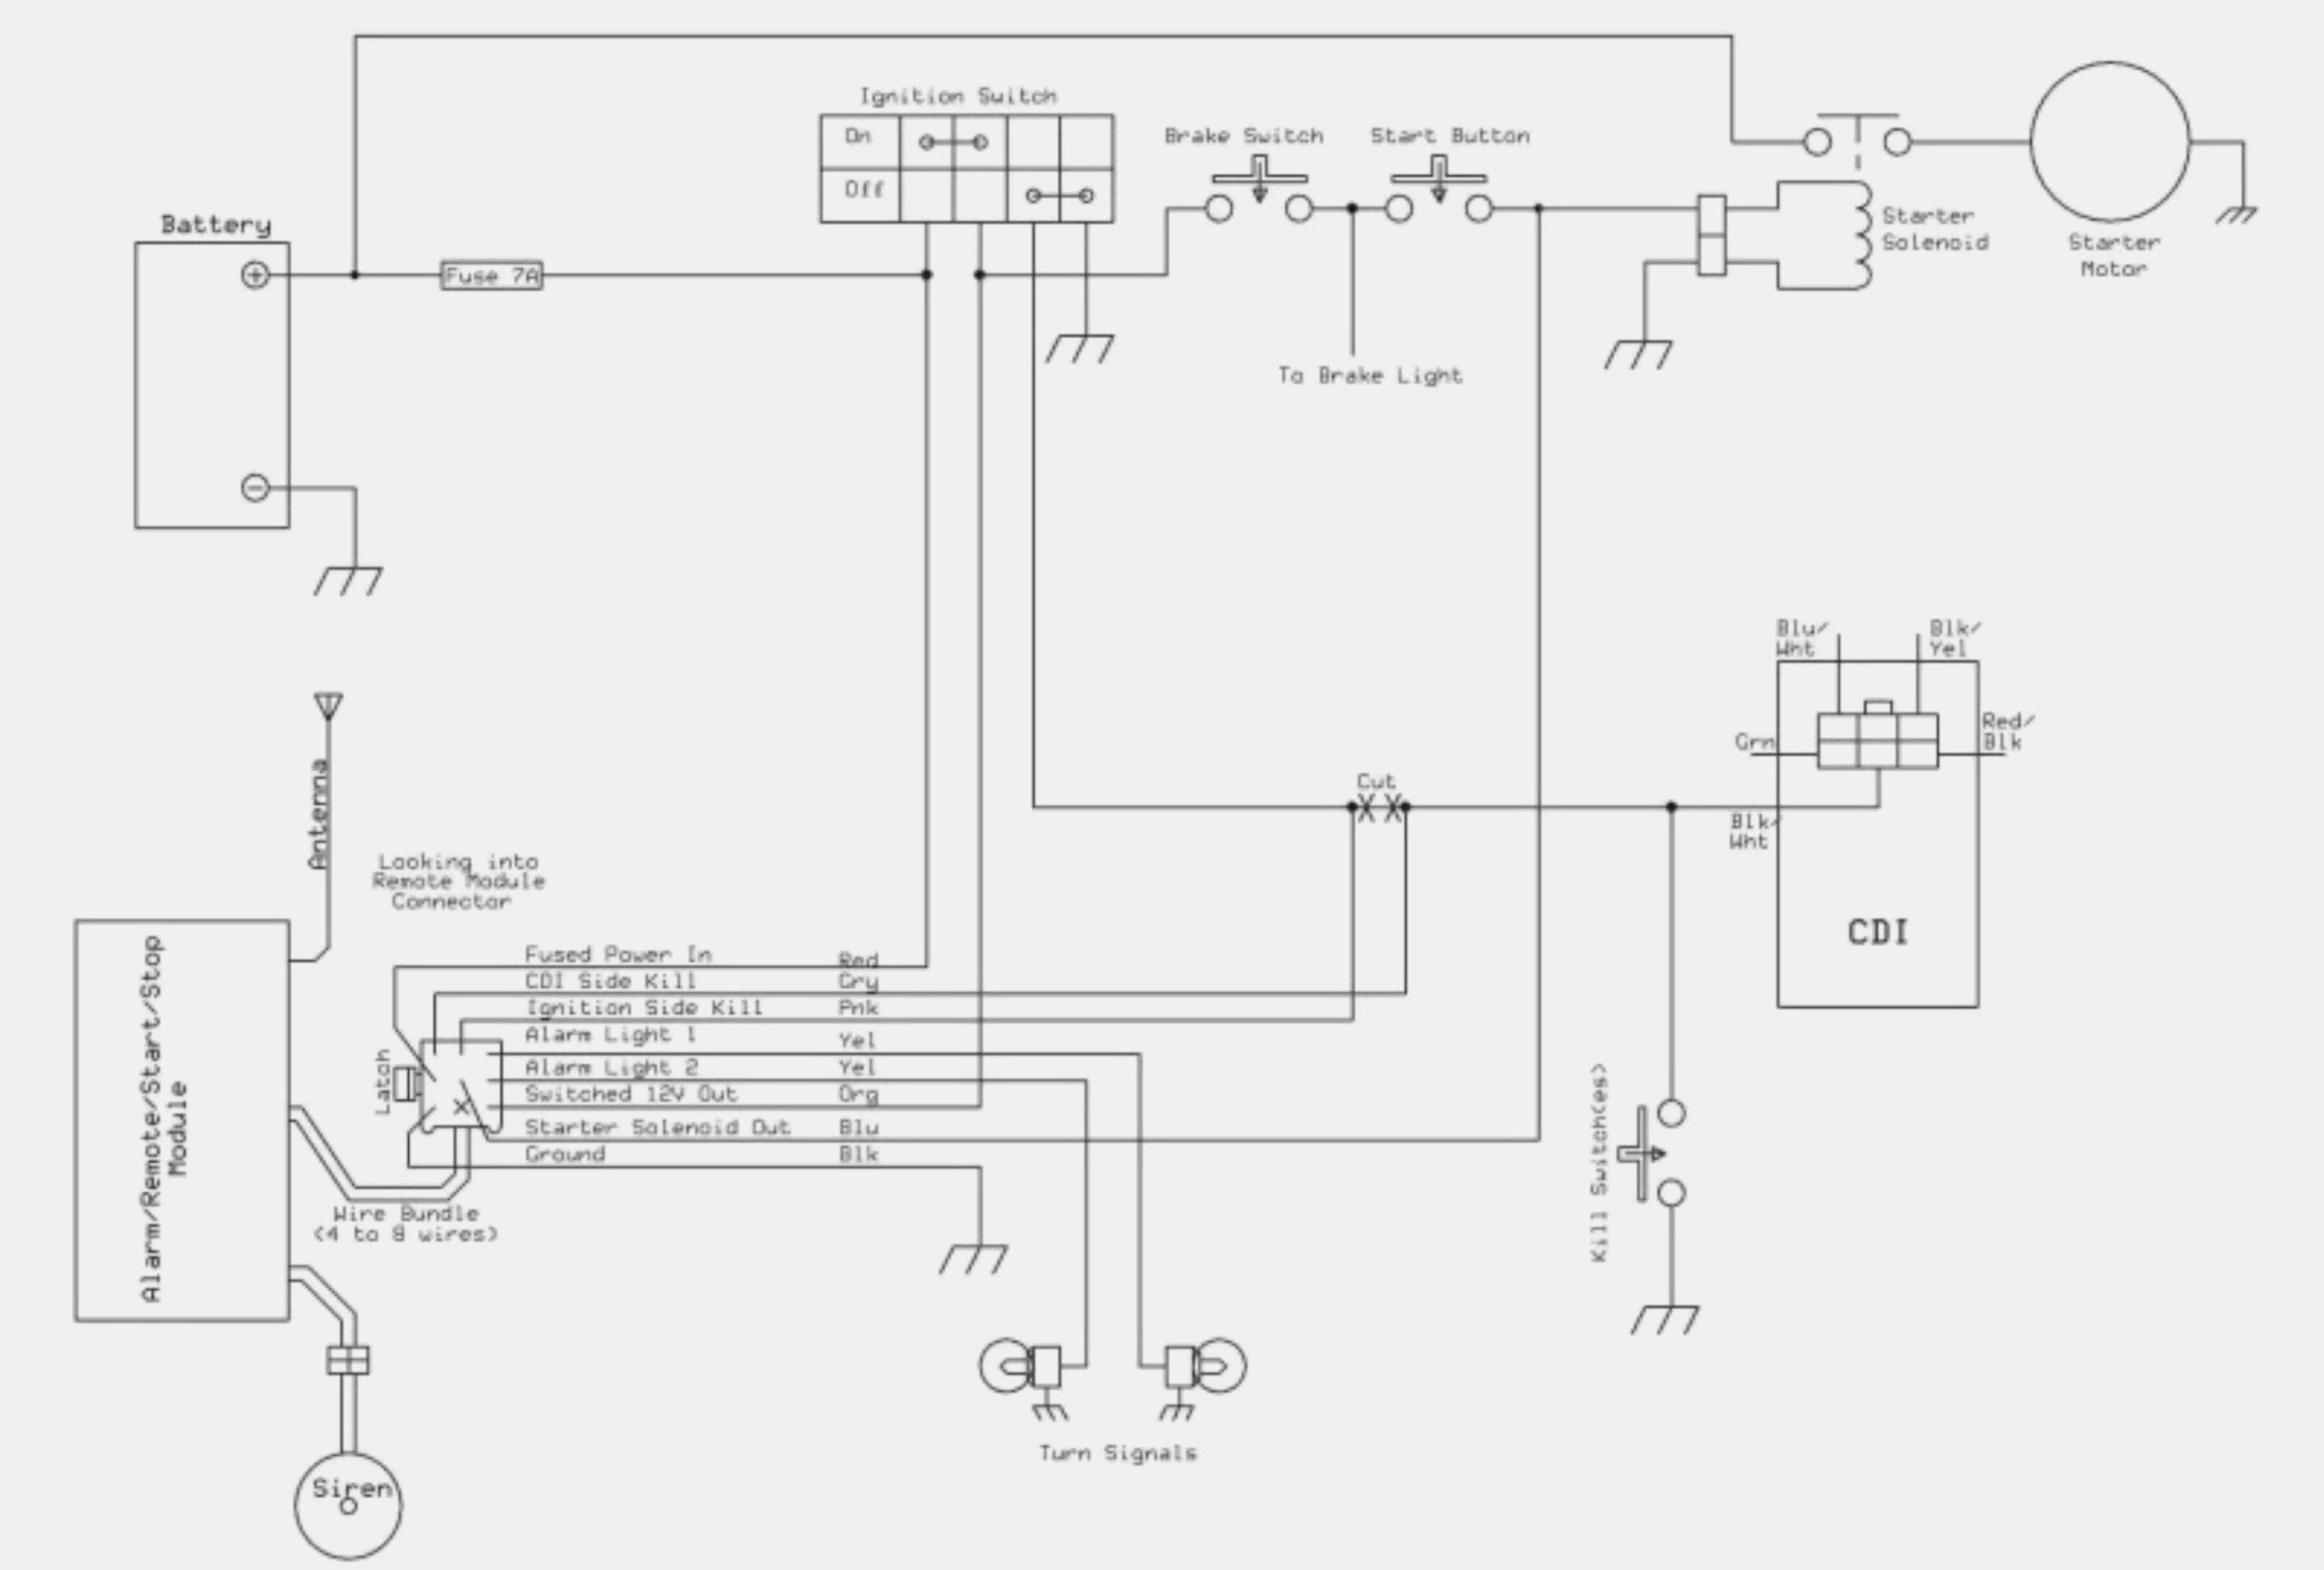 Rocketa Ignition Switch Wire Diagram Three | Wiring Diagram - Honda Gx390 Wiring Diagram